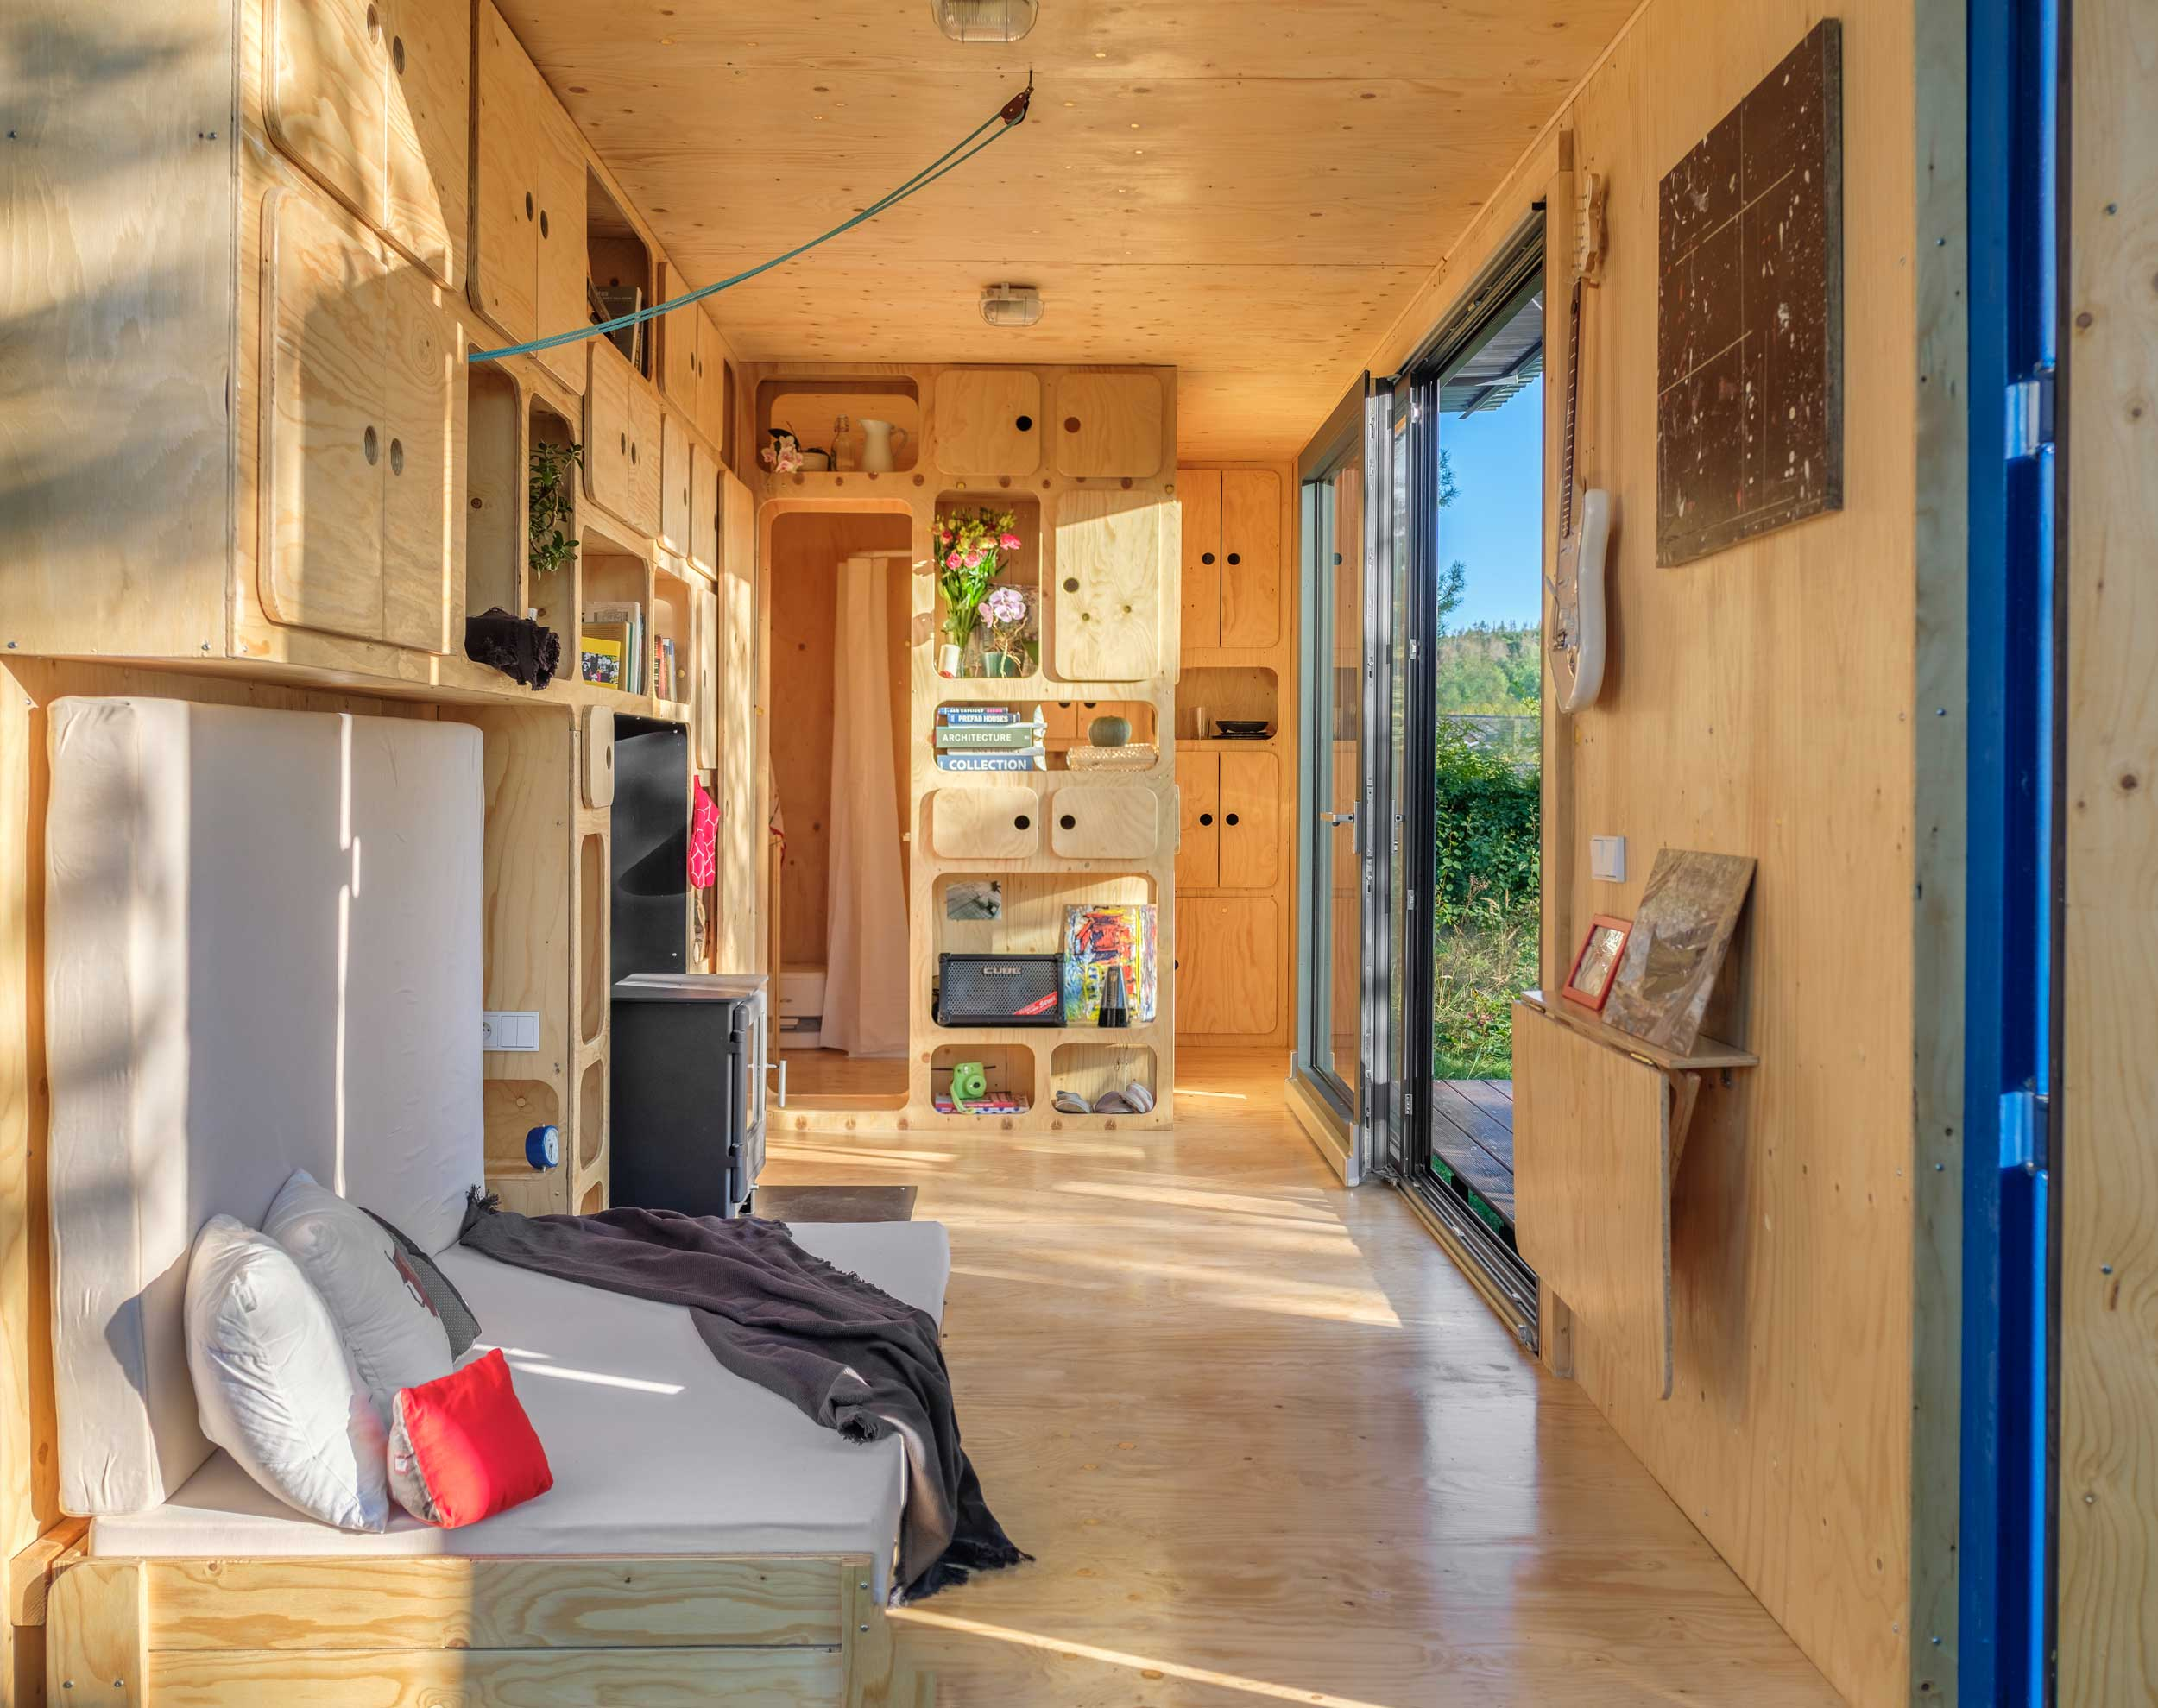 5 Eco Friendly Tiny House Design Trends For 2021 Cabin House Plans Home Floor Designs Garden Shed Plans Cottage Blueprints